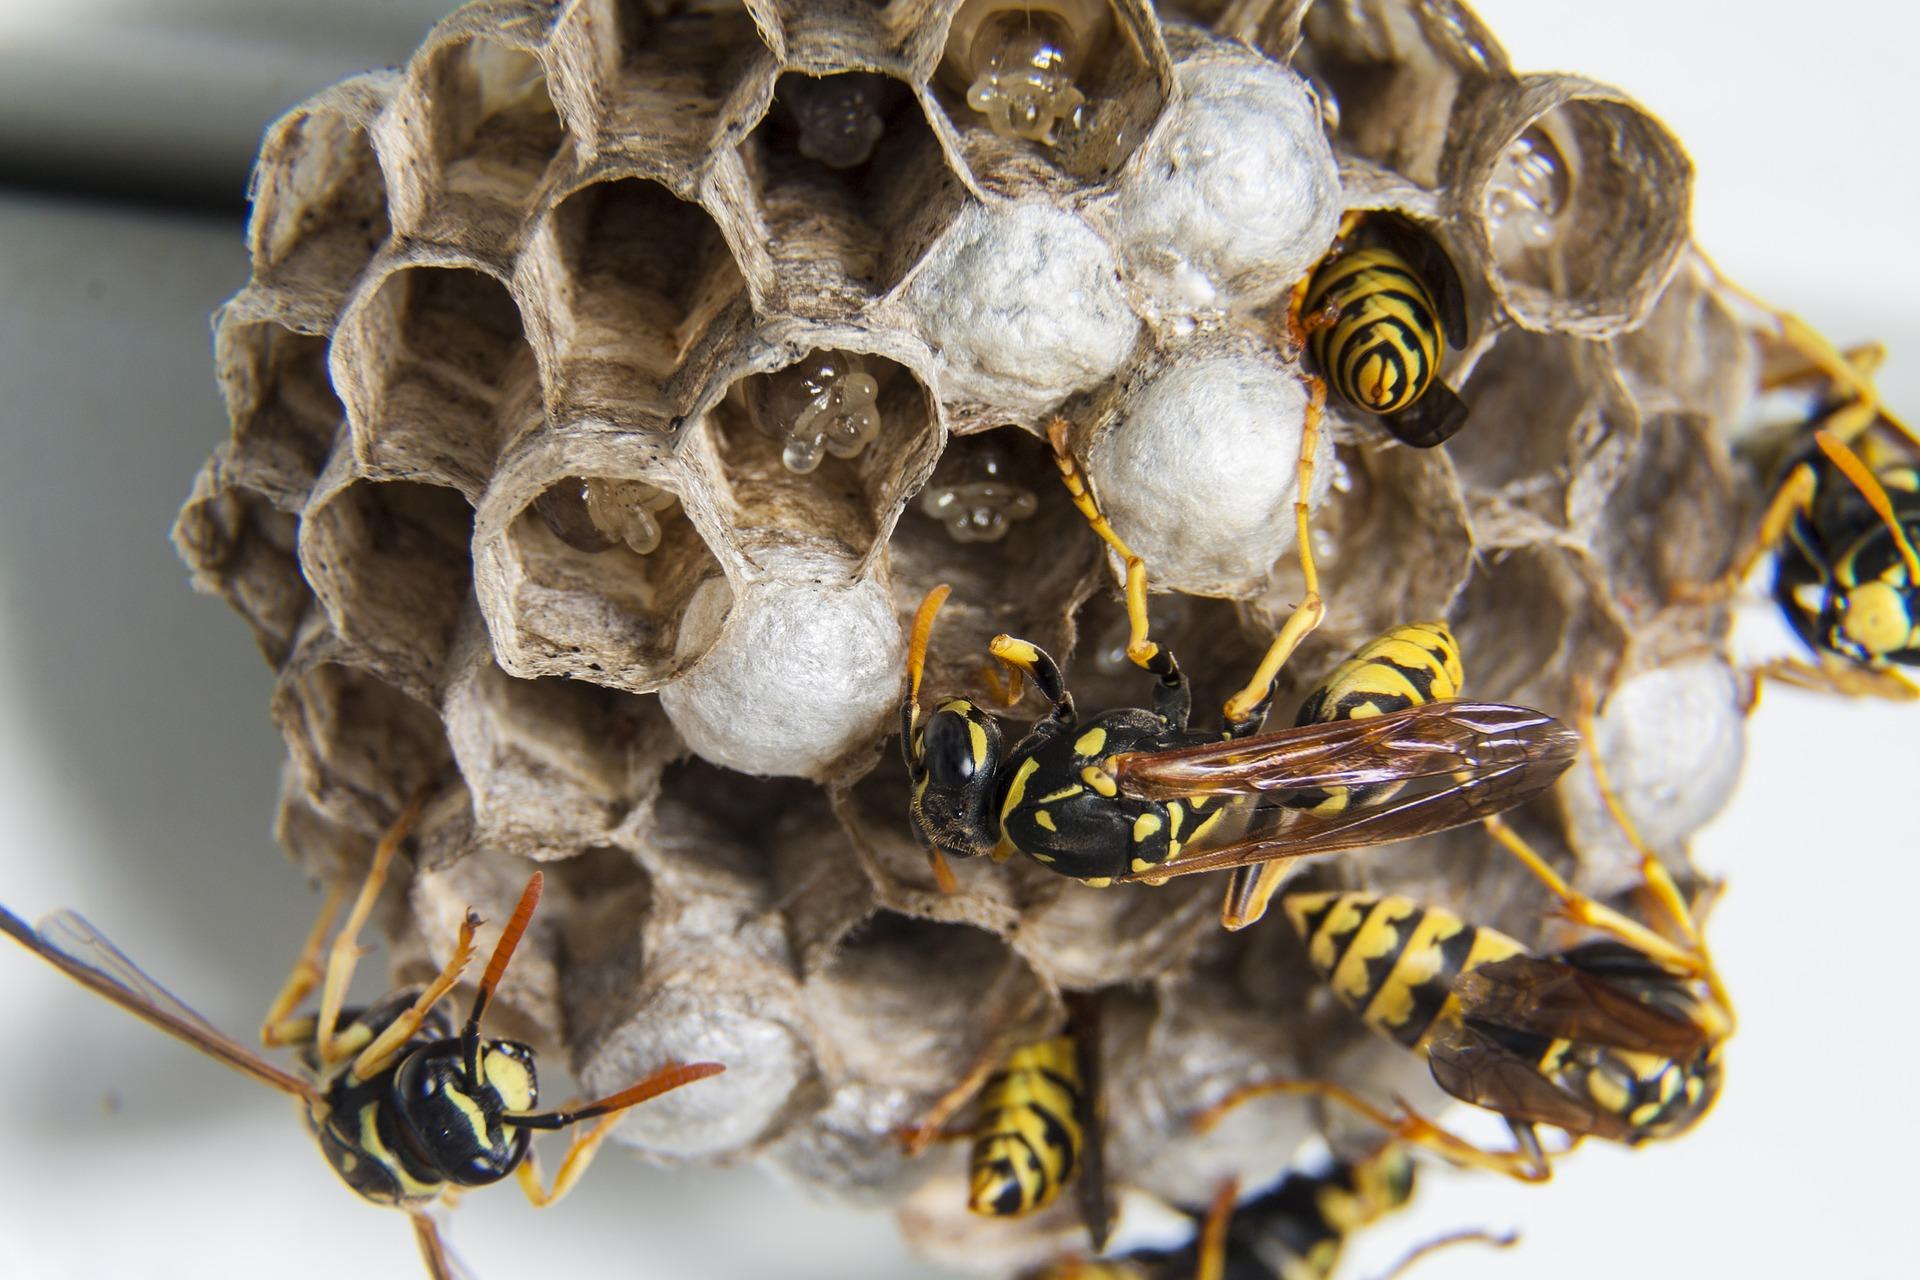 Wat kan ik doen tegen een beginnend wespennest